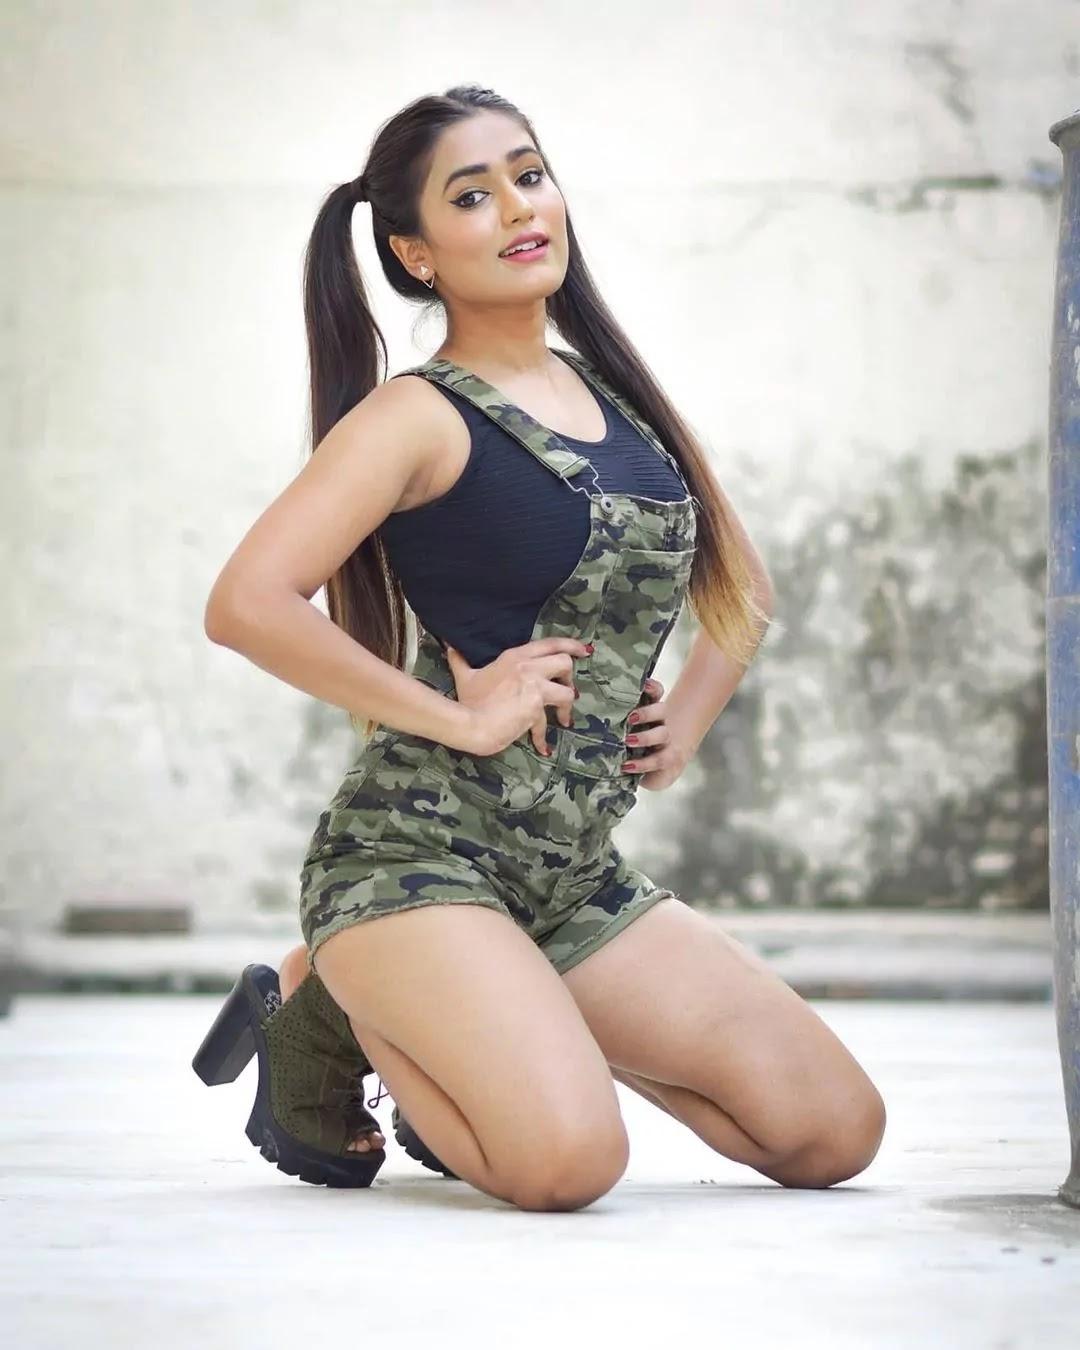 Famous tiktok girl garima chaurasia